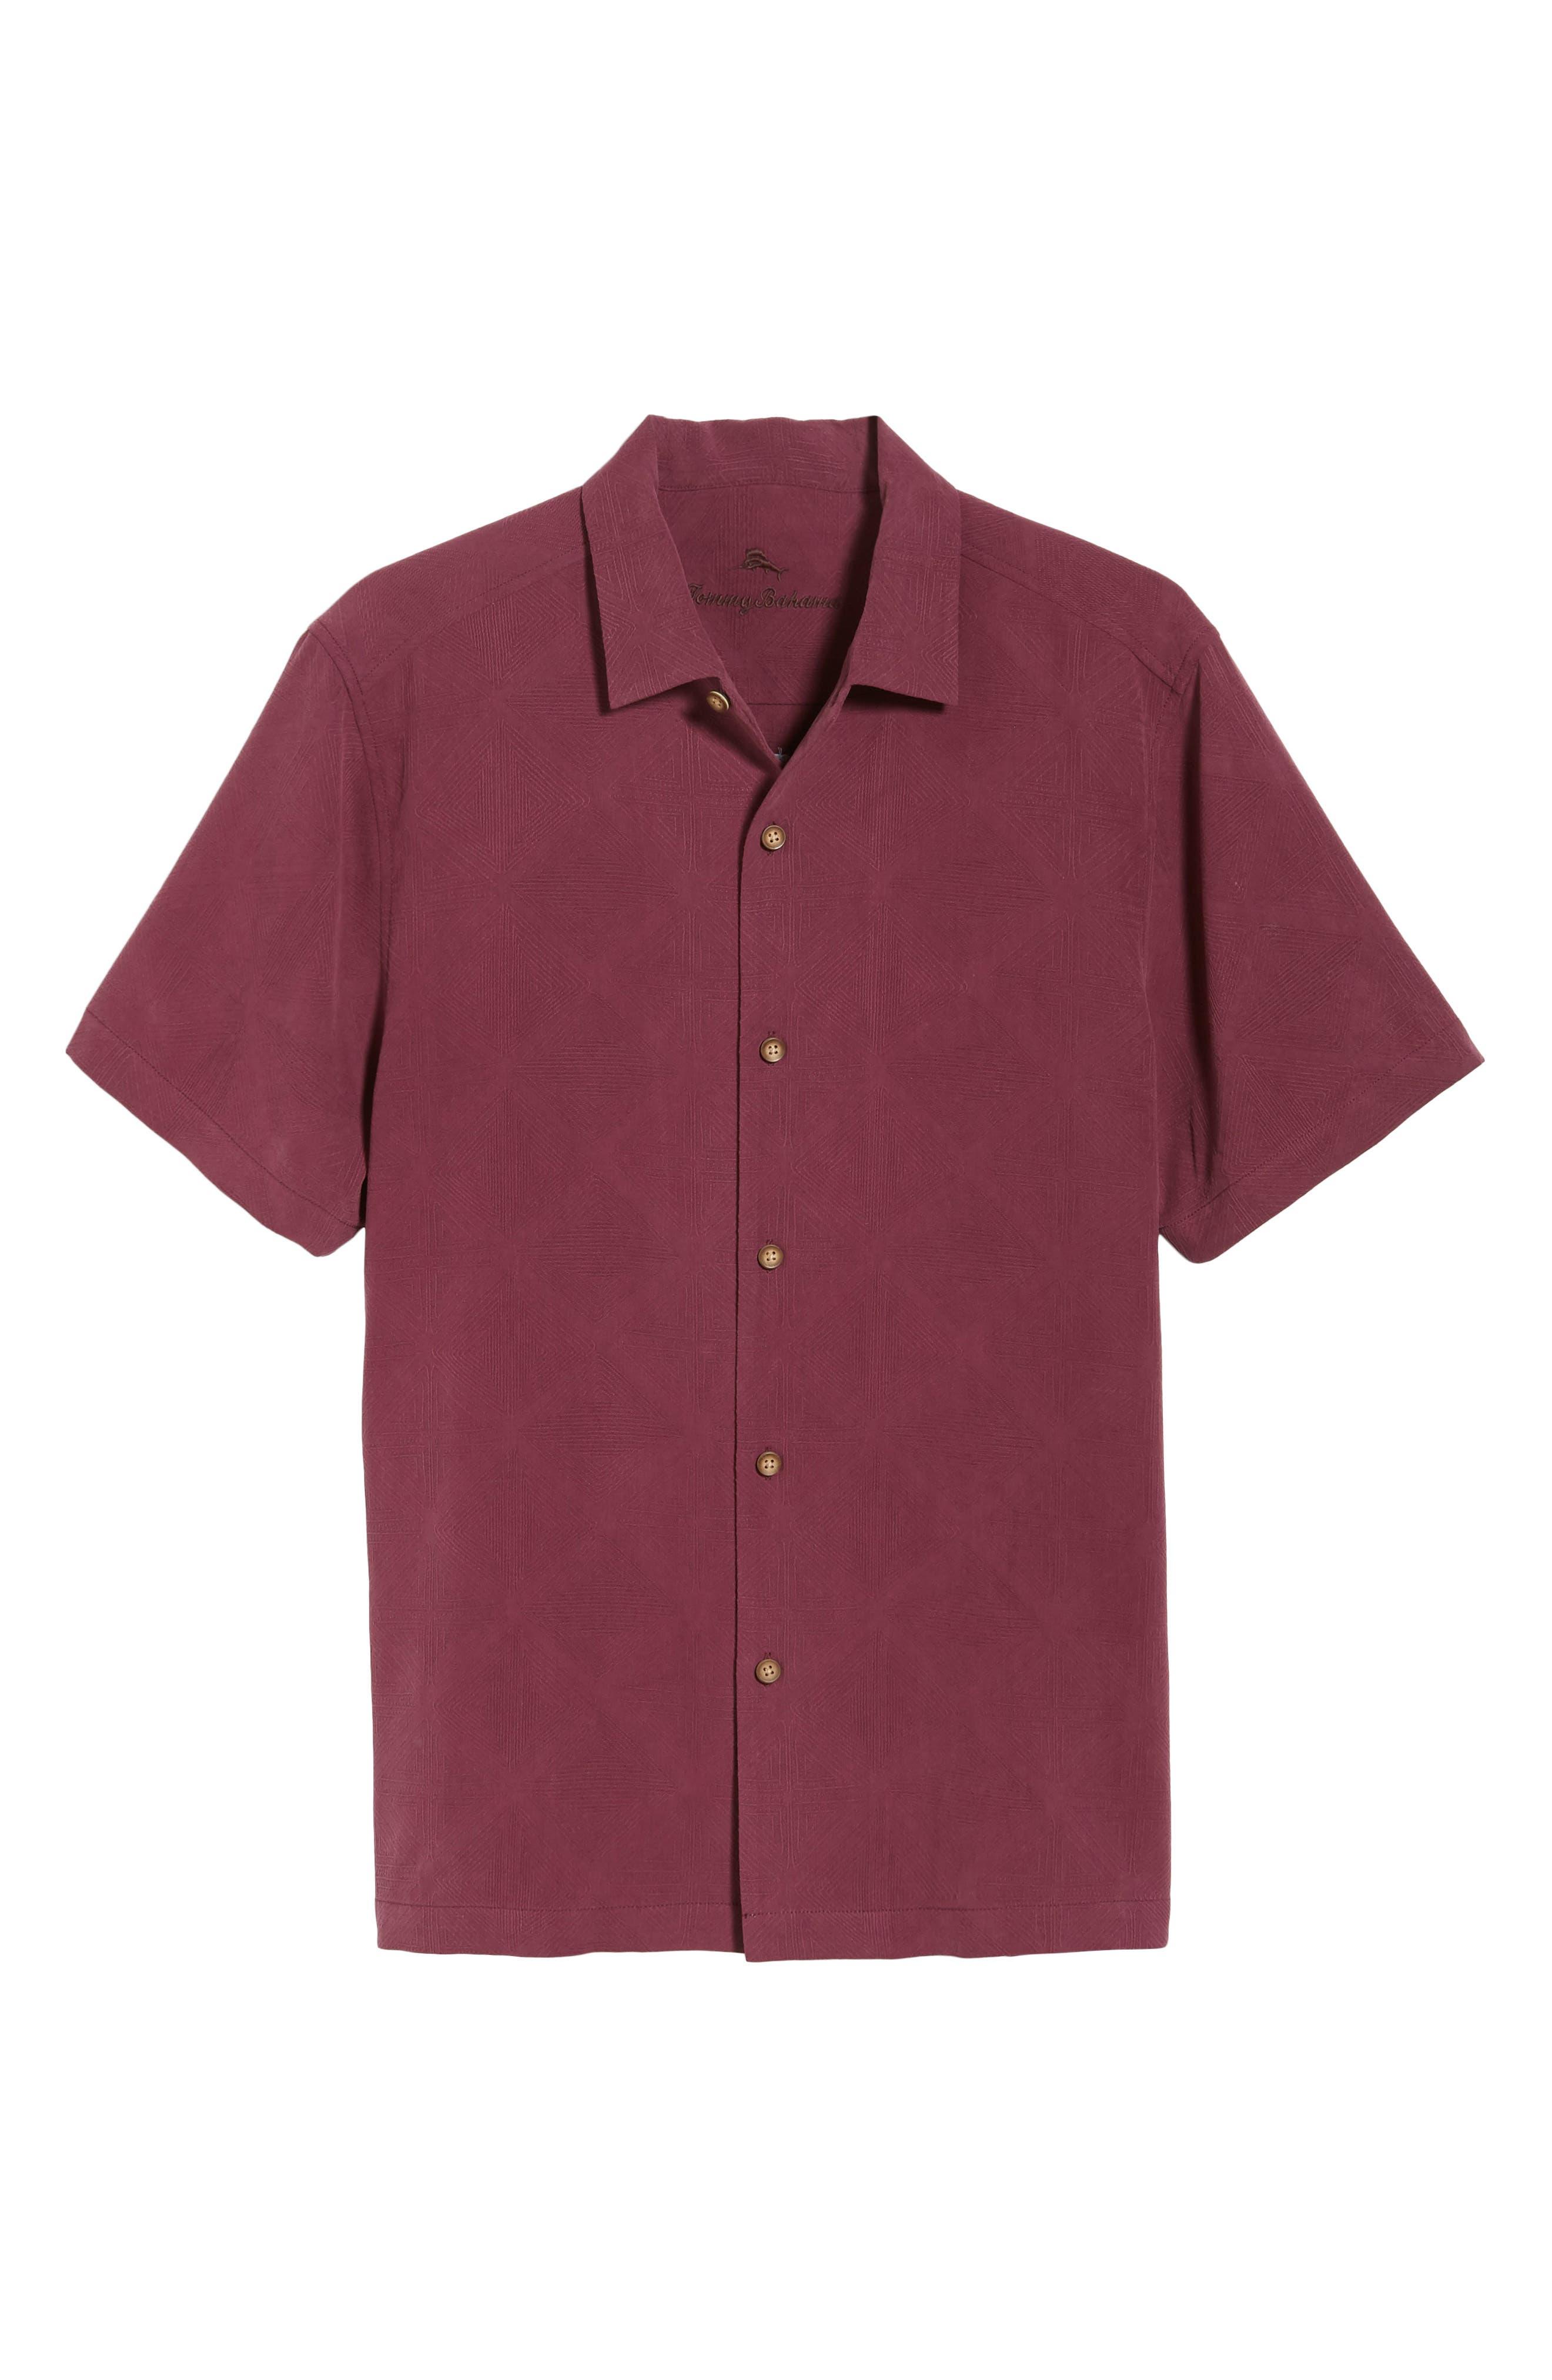 Pura Vino Embroidered Silk Sport Shirt,                             Alternate thumbnail 6, color,                             GRAPE WINE